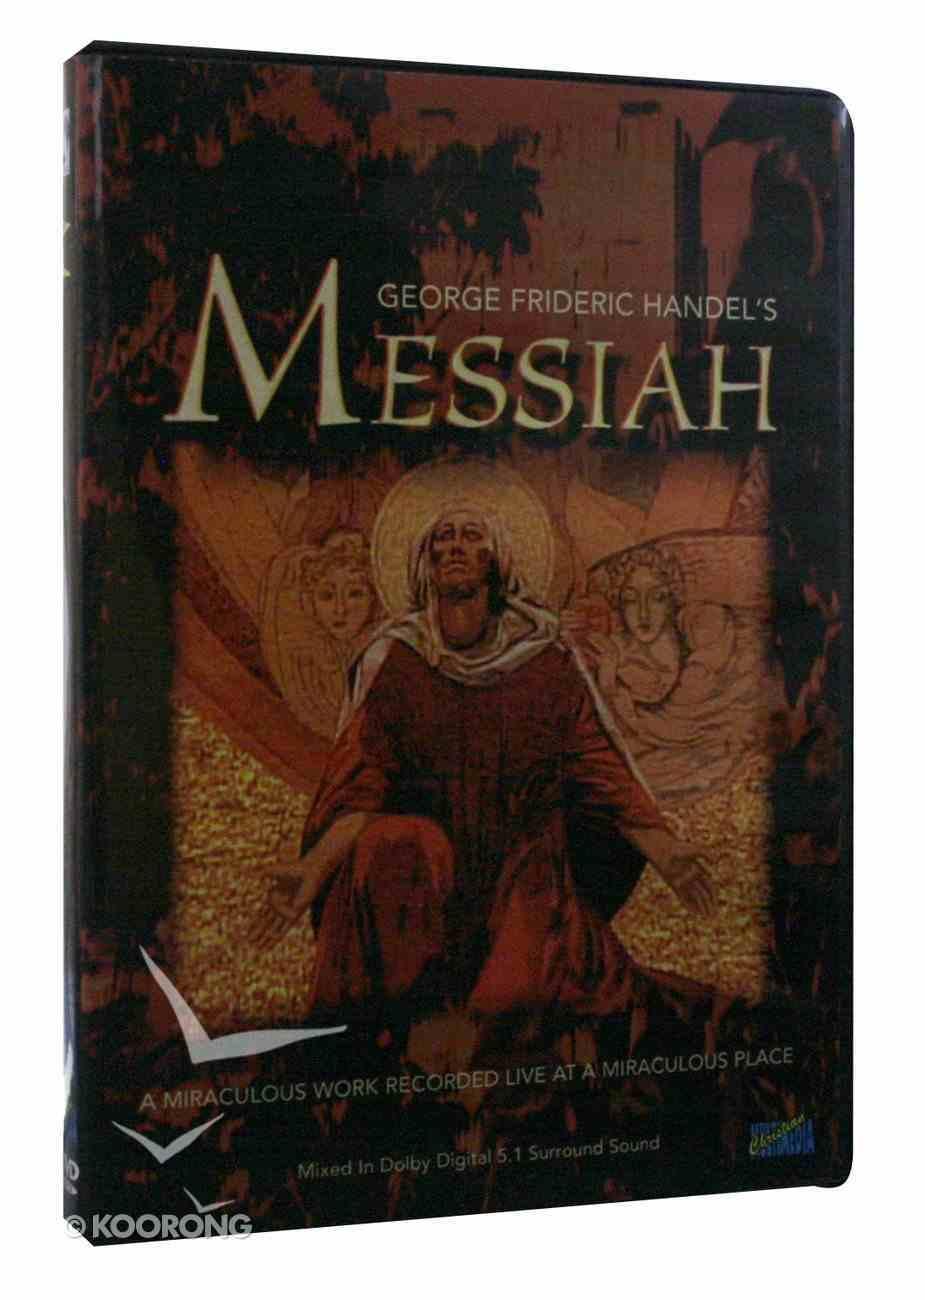 George Frideric Handel's Messiah DVD